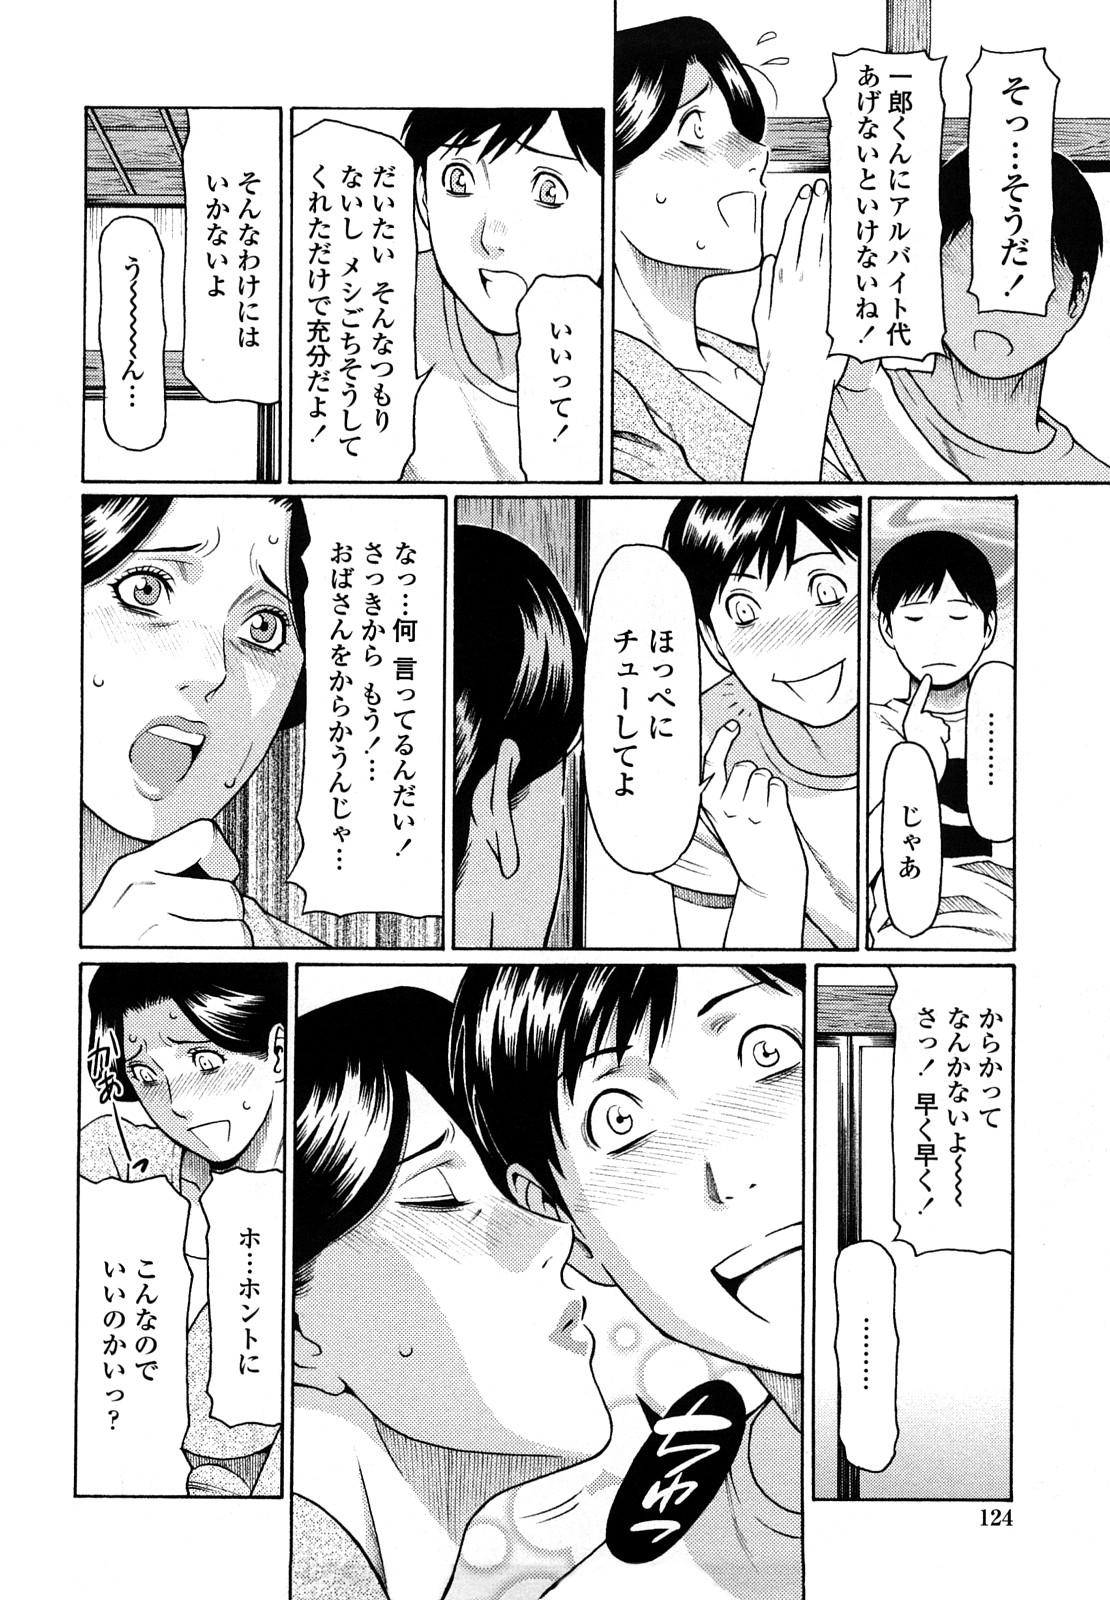 [Takasugi Kou] Kindan no Haha-Ana - Immorality Love-Hole [Decensored] 125